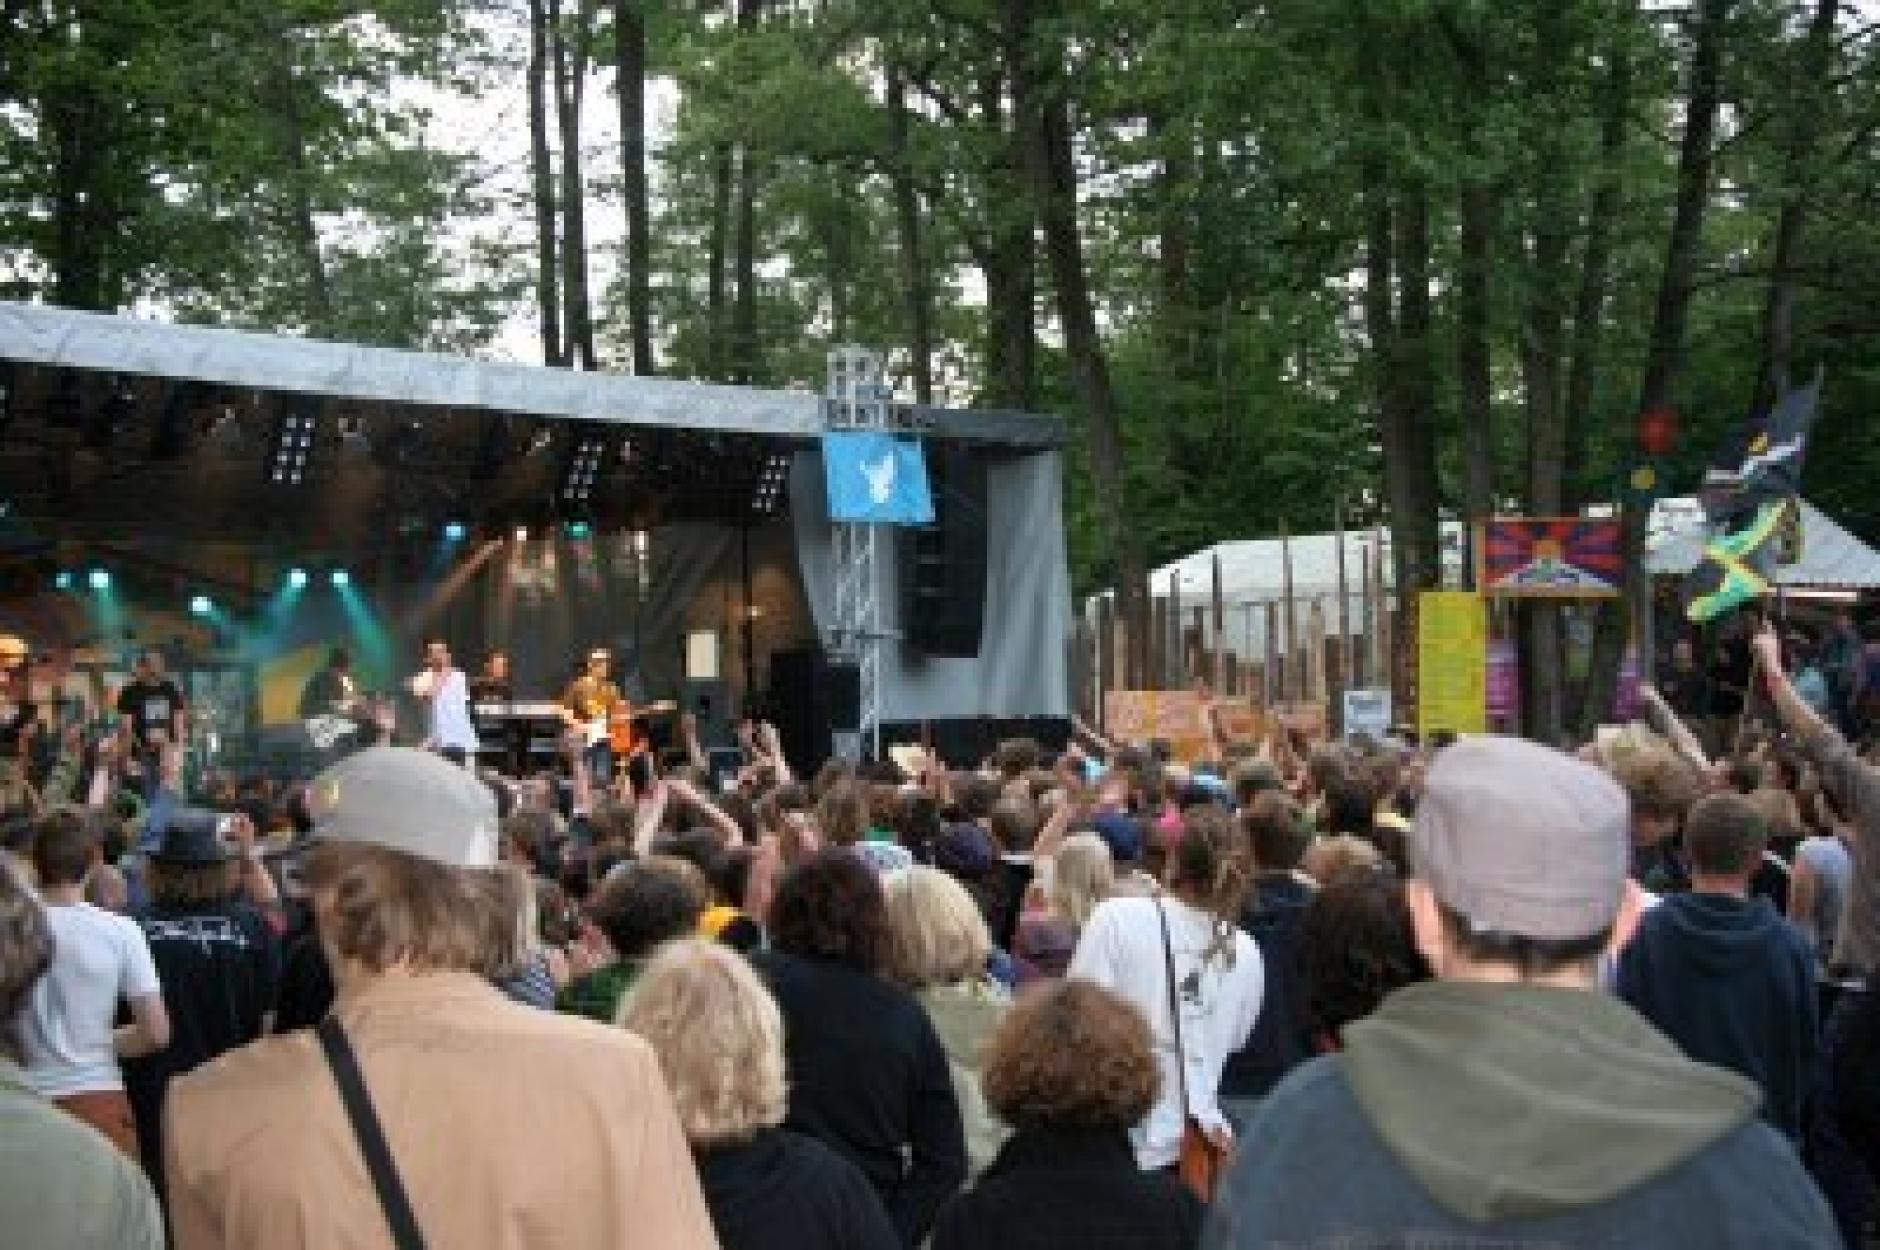 Woodstock-Festival in Dornstadt | Rieser Nachrichten